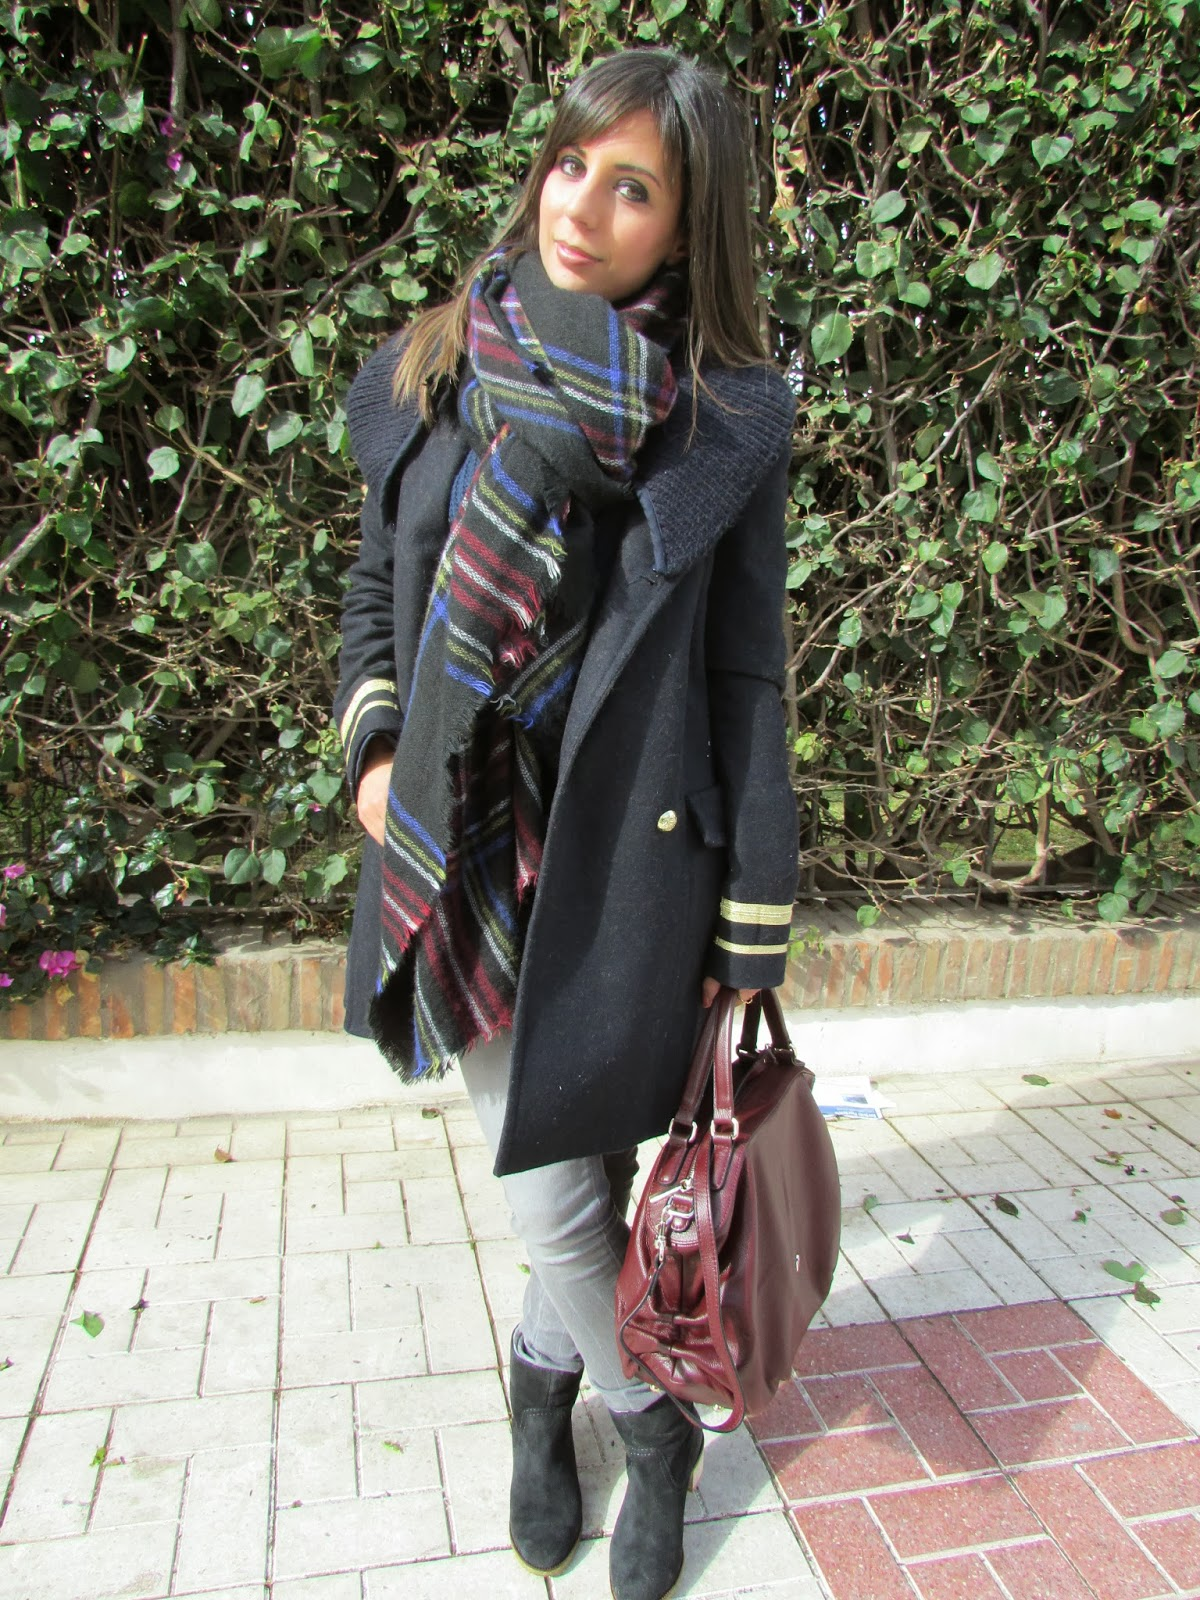 cristina style fashion blogger malagueña street style ootd outfits looks tendencias moda